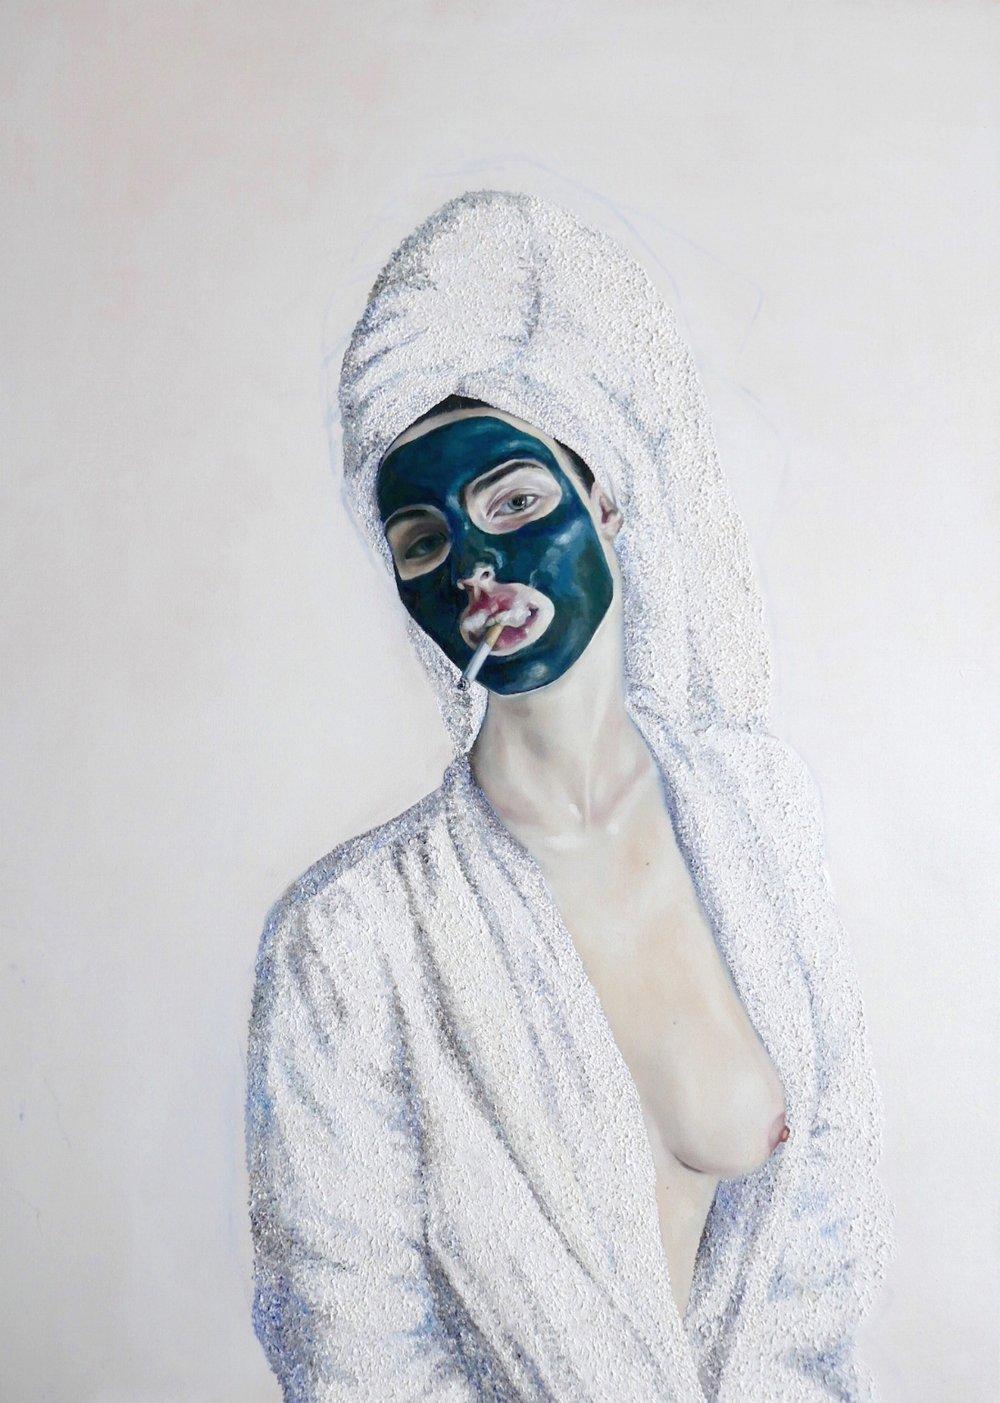 Tali+Lennox+Art+Painting.jpg